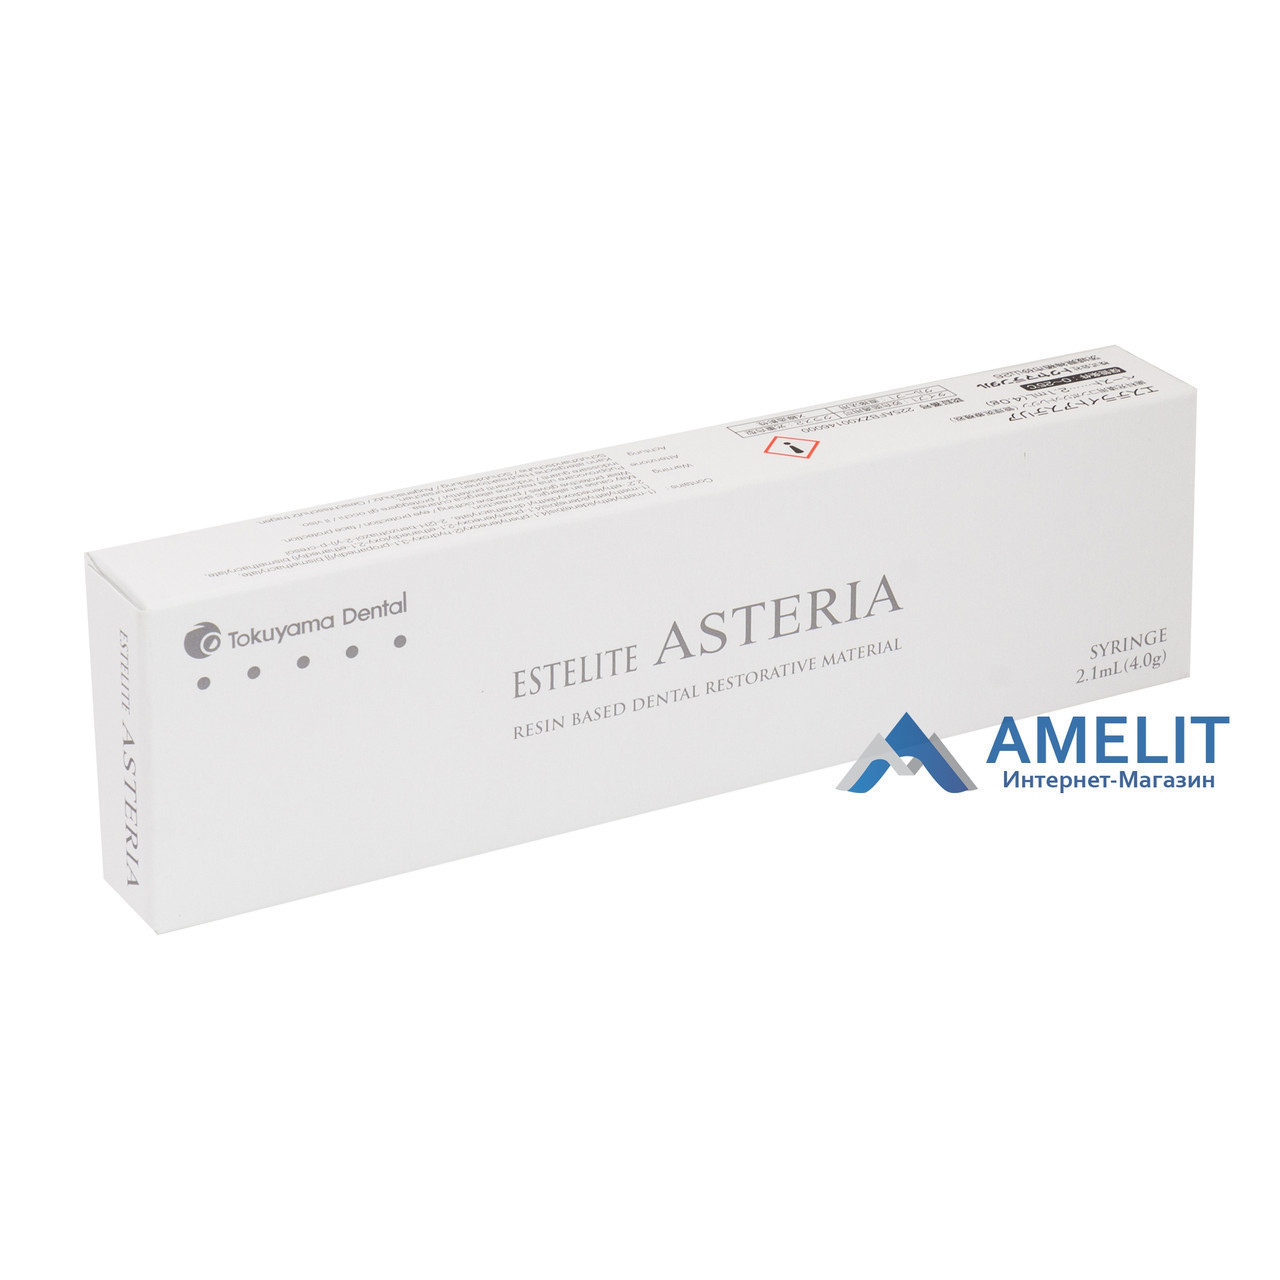 Эстелайт Астерия NE (Estelite Asteria, Tokuyama Dental), шприц 4г